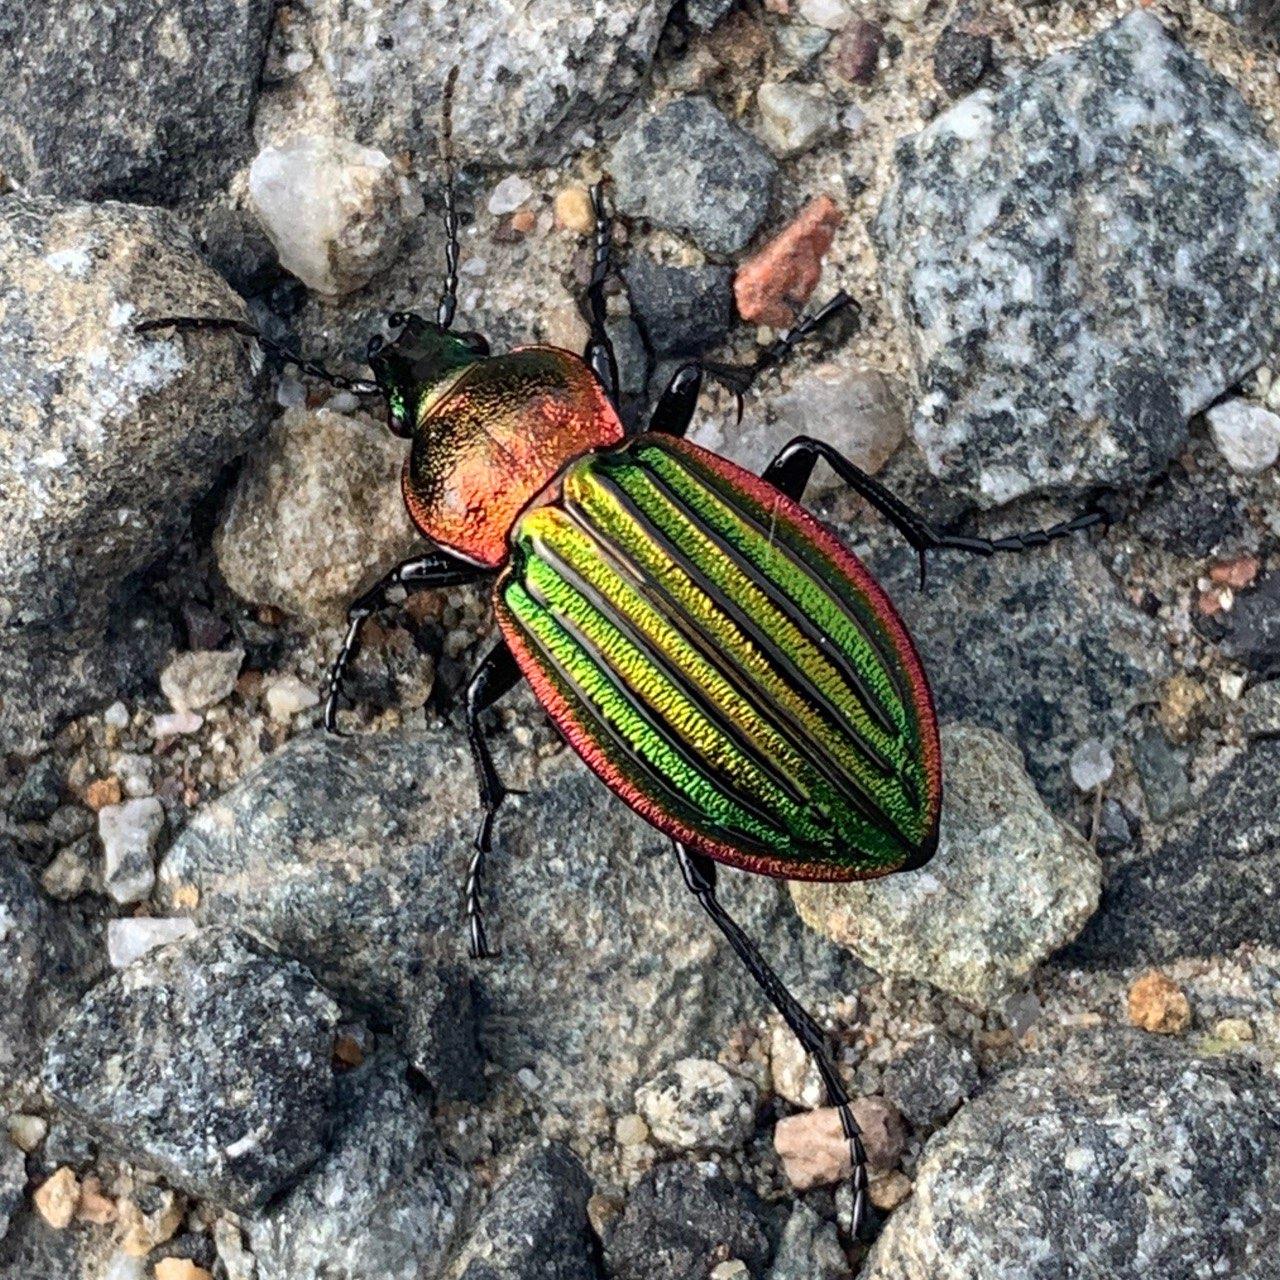 Ground Beetle. Carabus nitens perhaps.